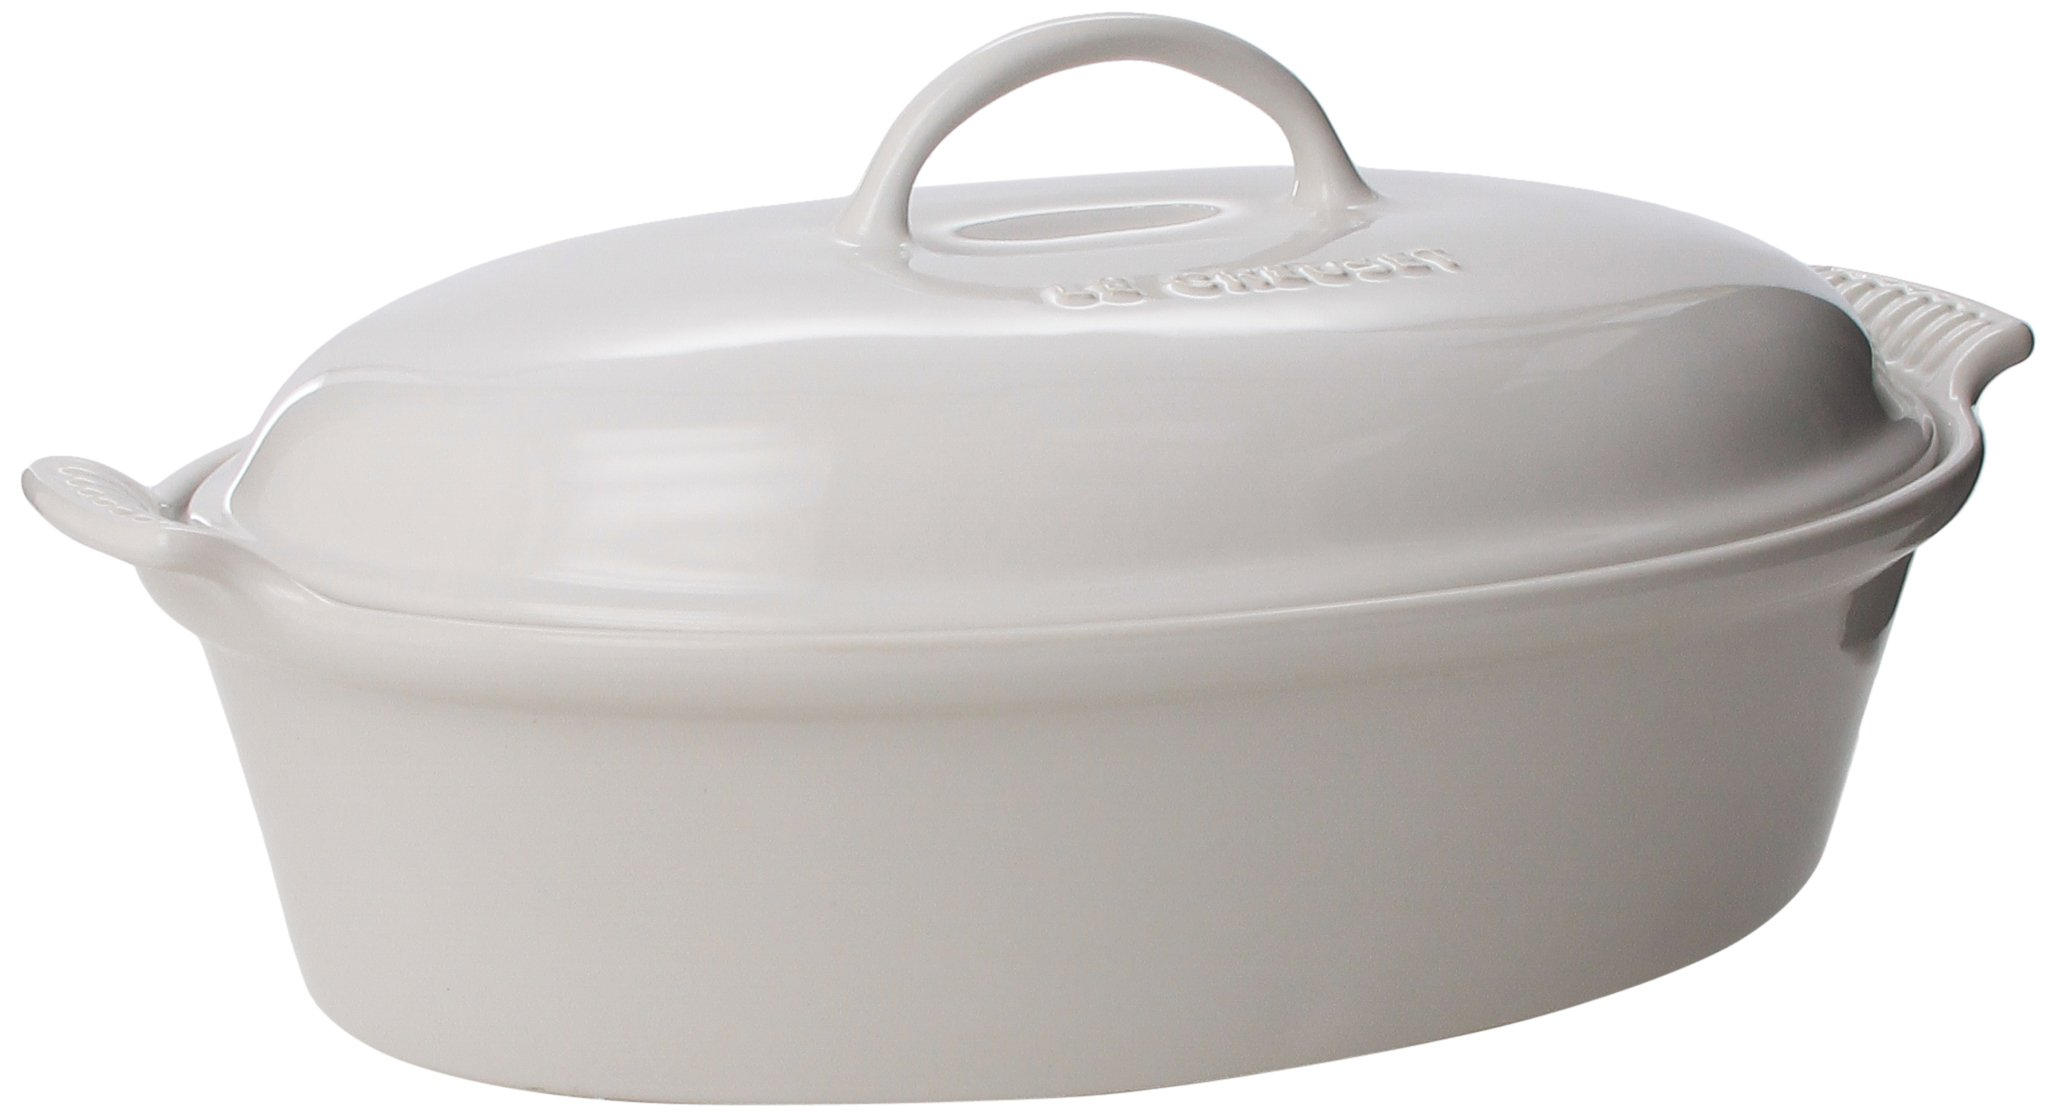 Le Creuset Stoneware 4-Quart Covered Oval Casserole, White